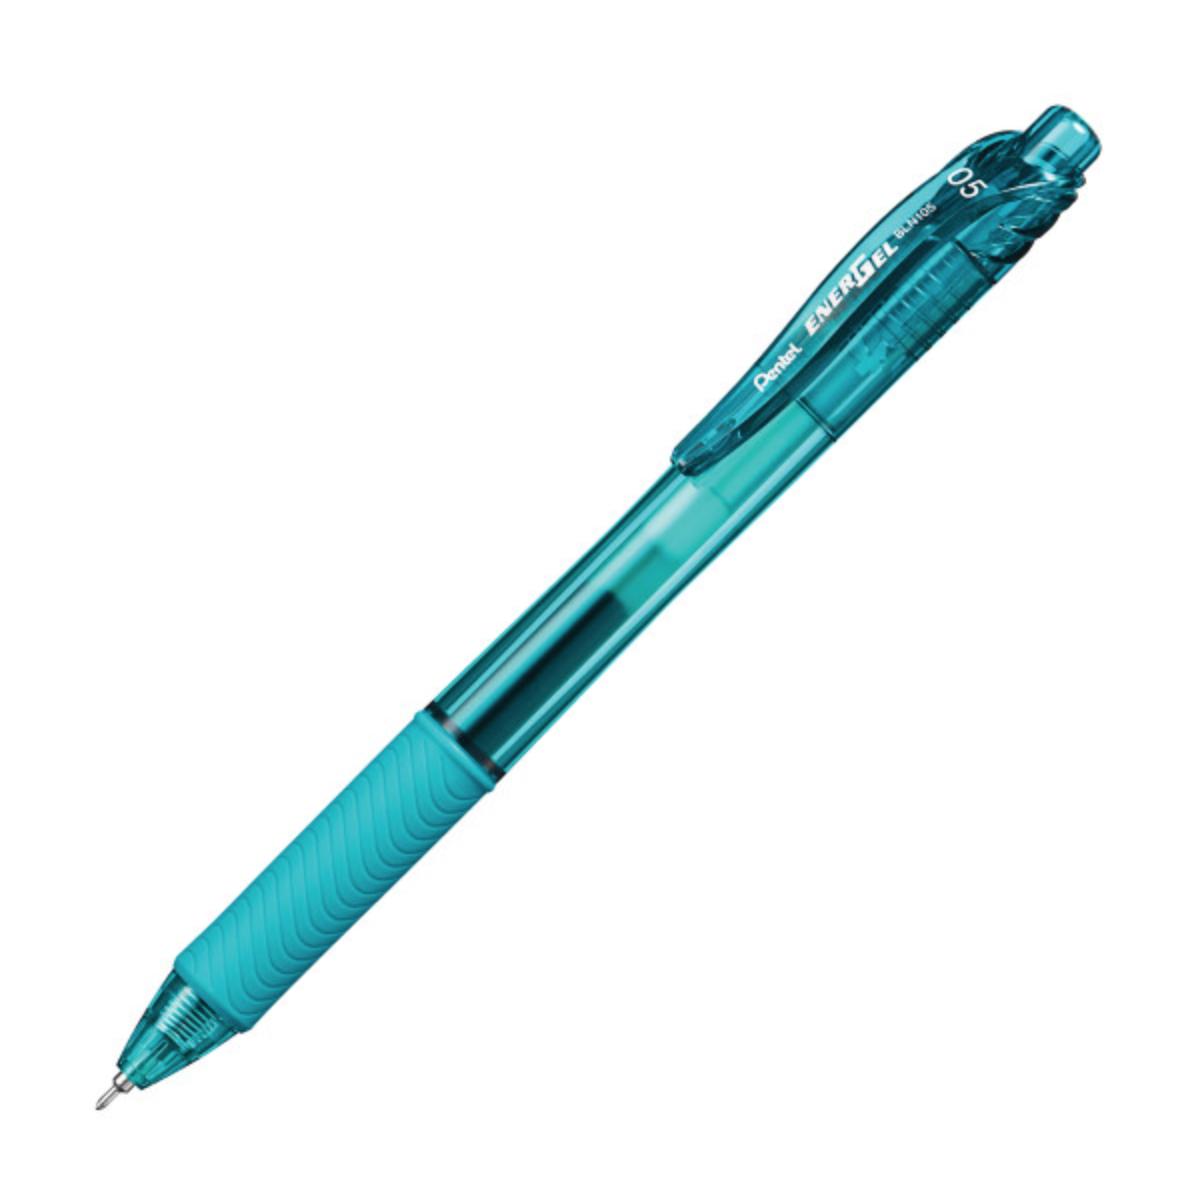 ENERGEL-X Needle Point Ballpoint Pen